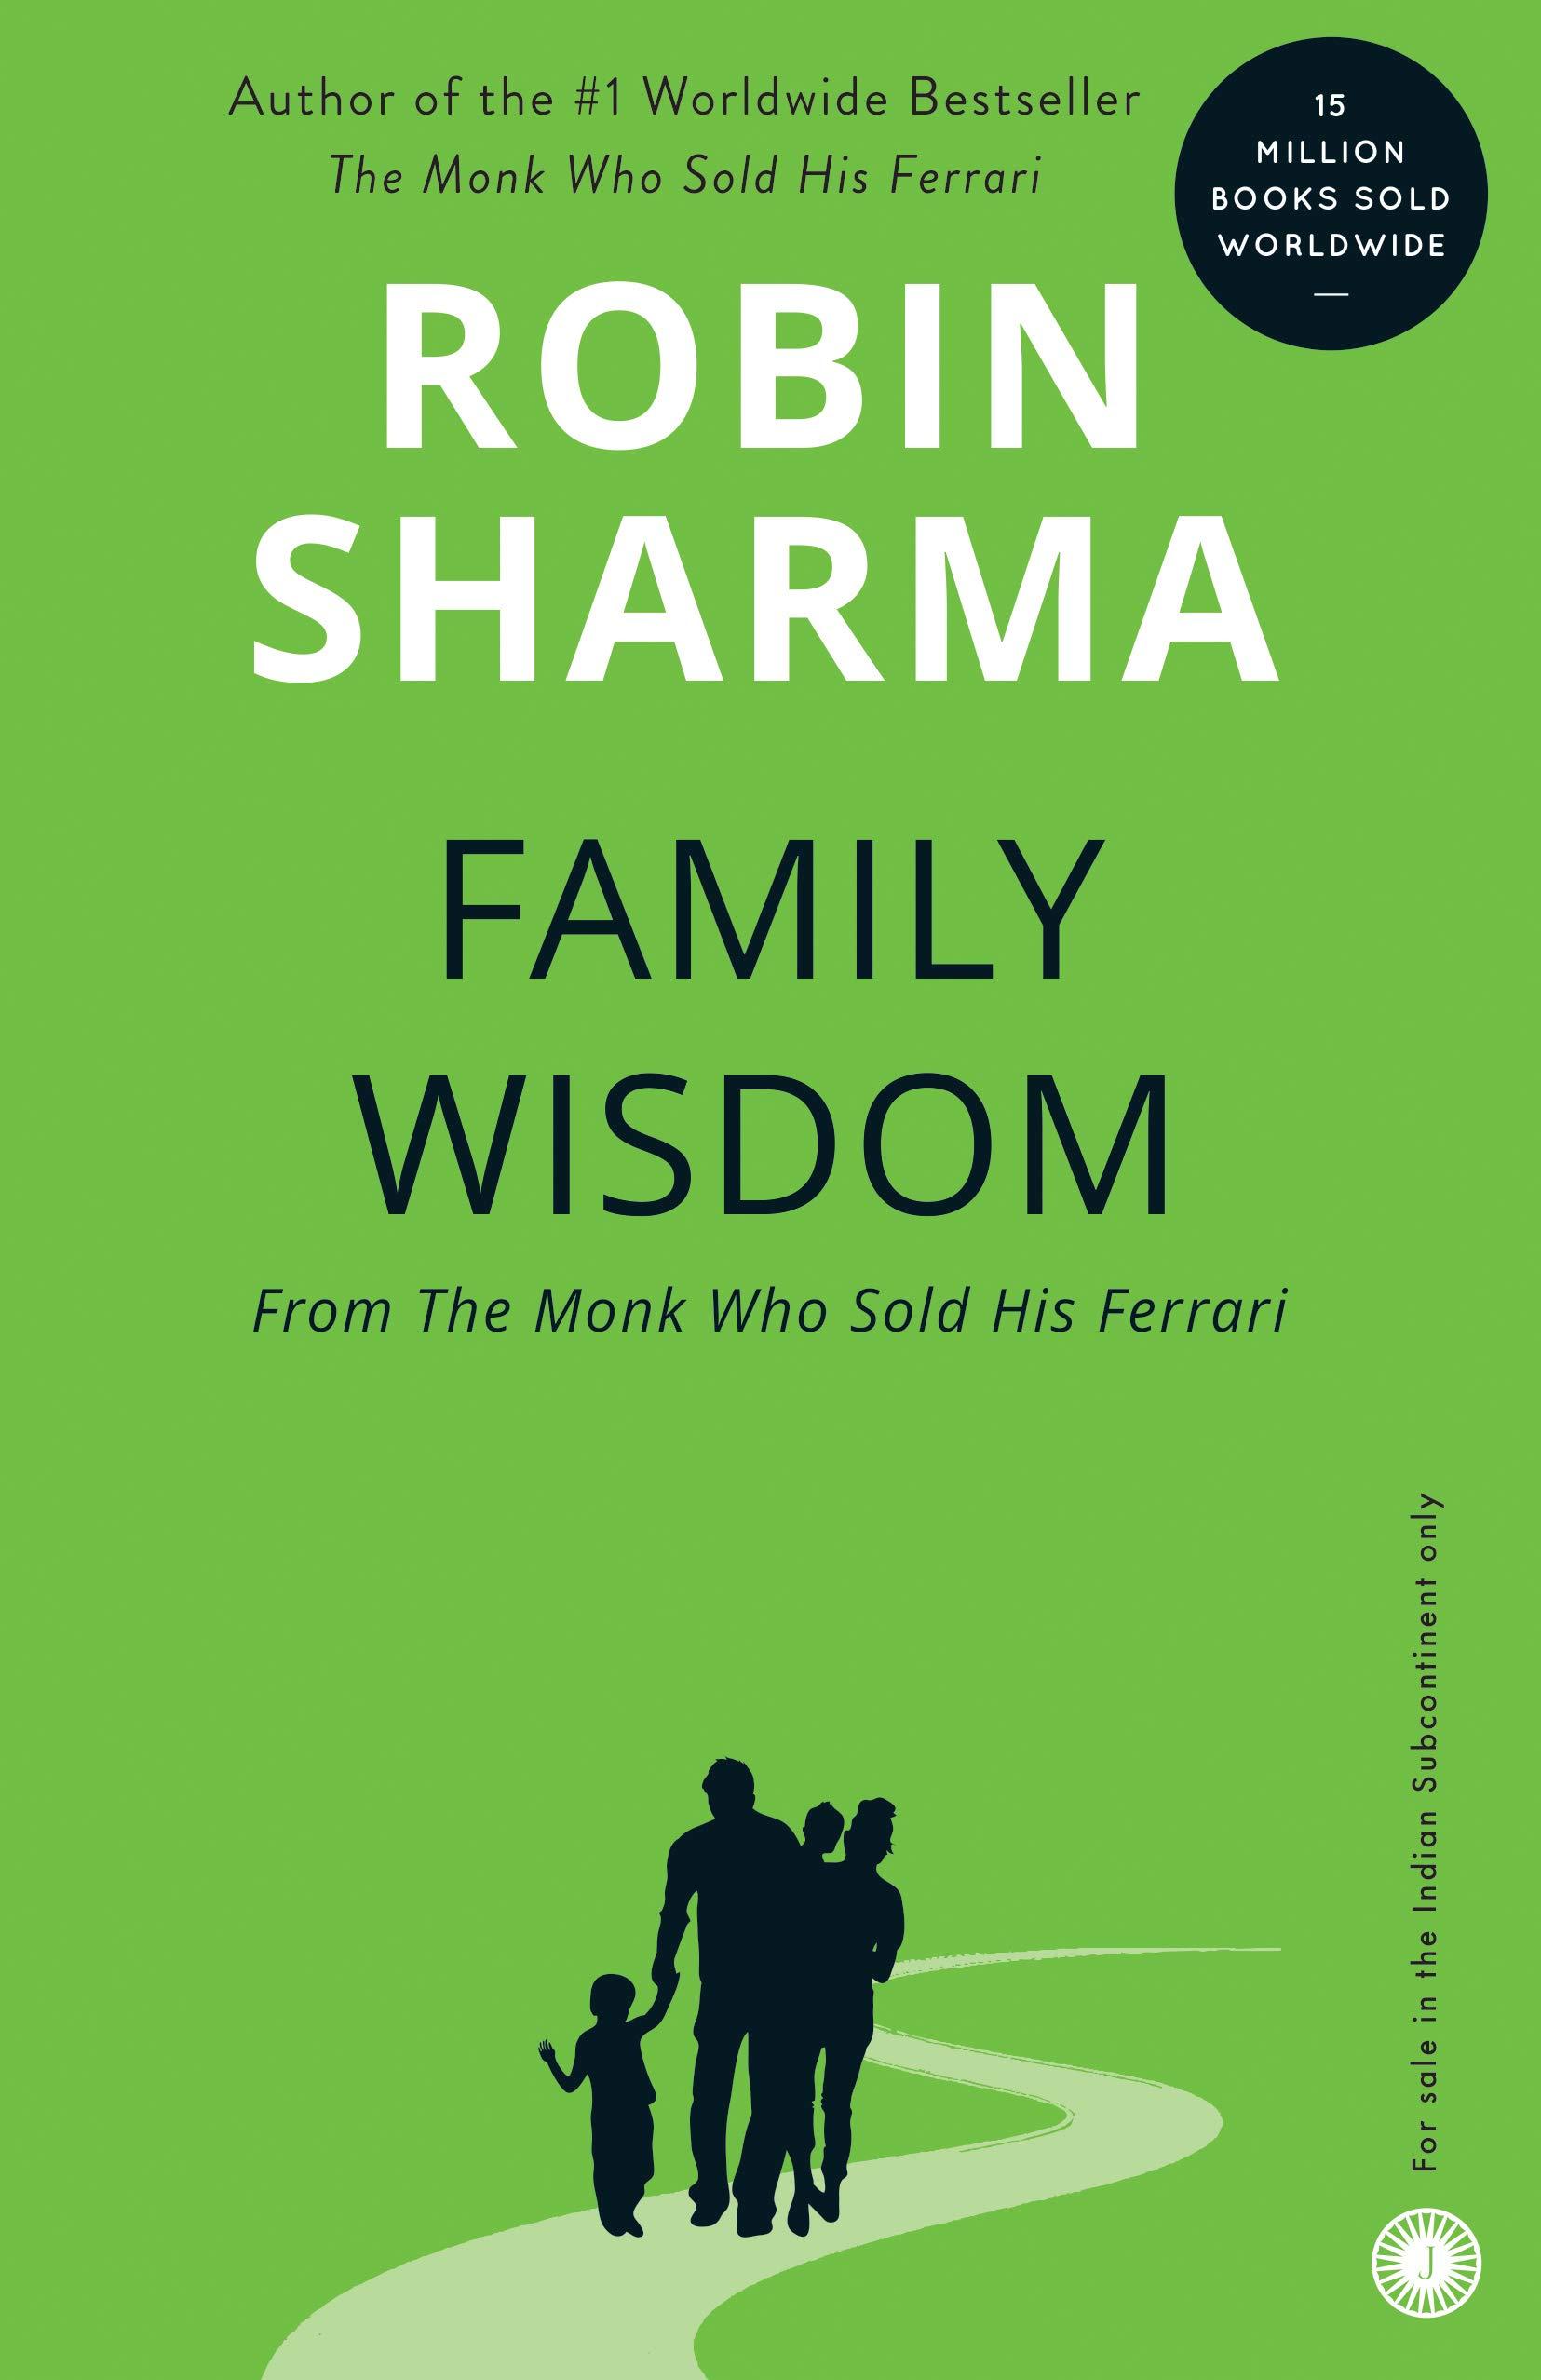 Family Wisdom From The Monk Who Sold His Ferrari Nurturing The Leader Within Your Child Amazon De Sharma Robin Fremdsprachige Bücher